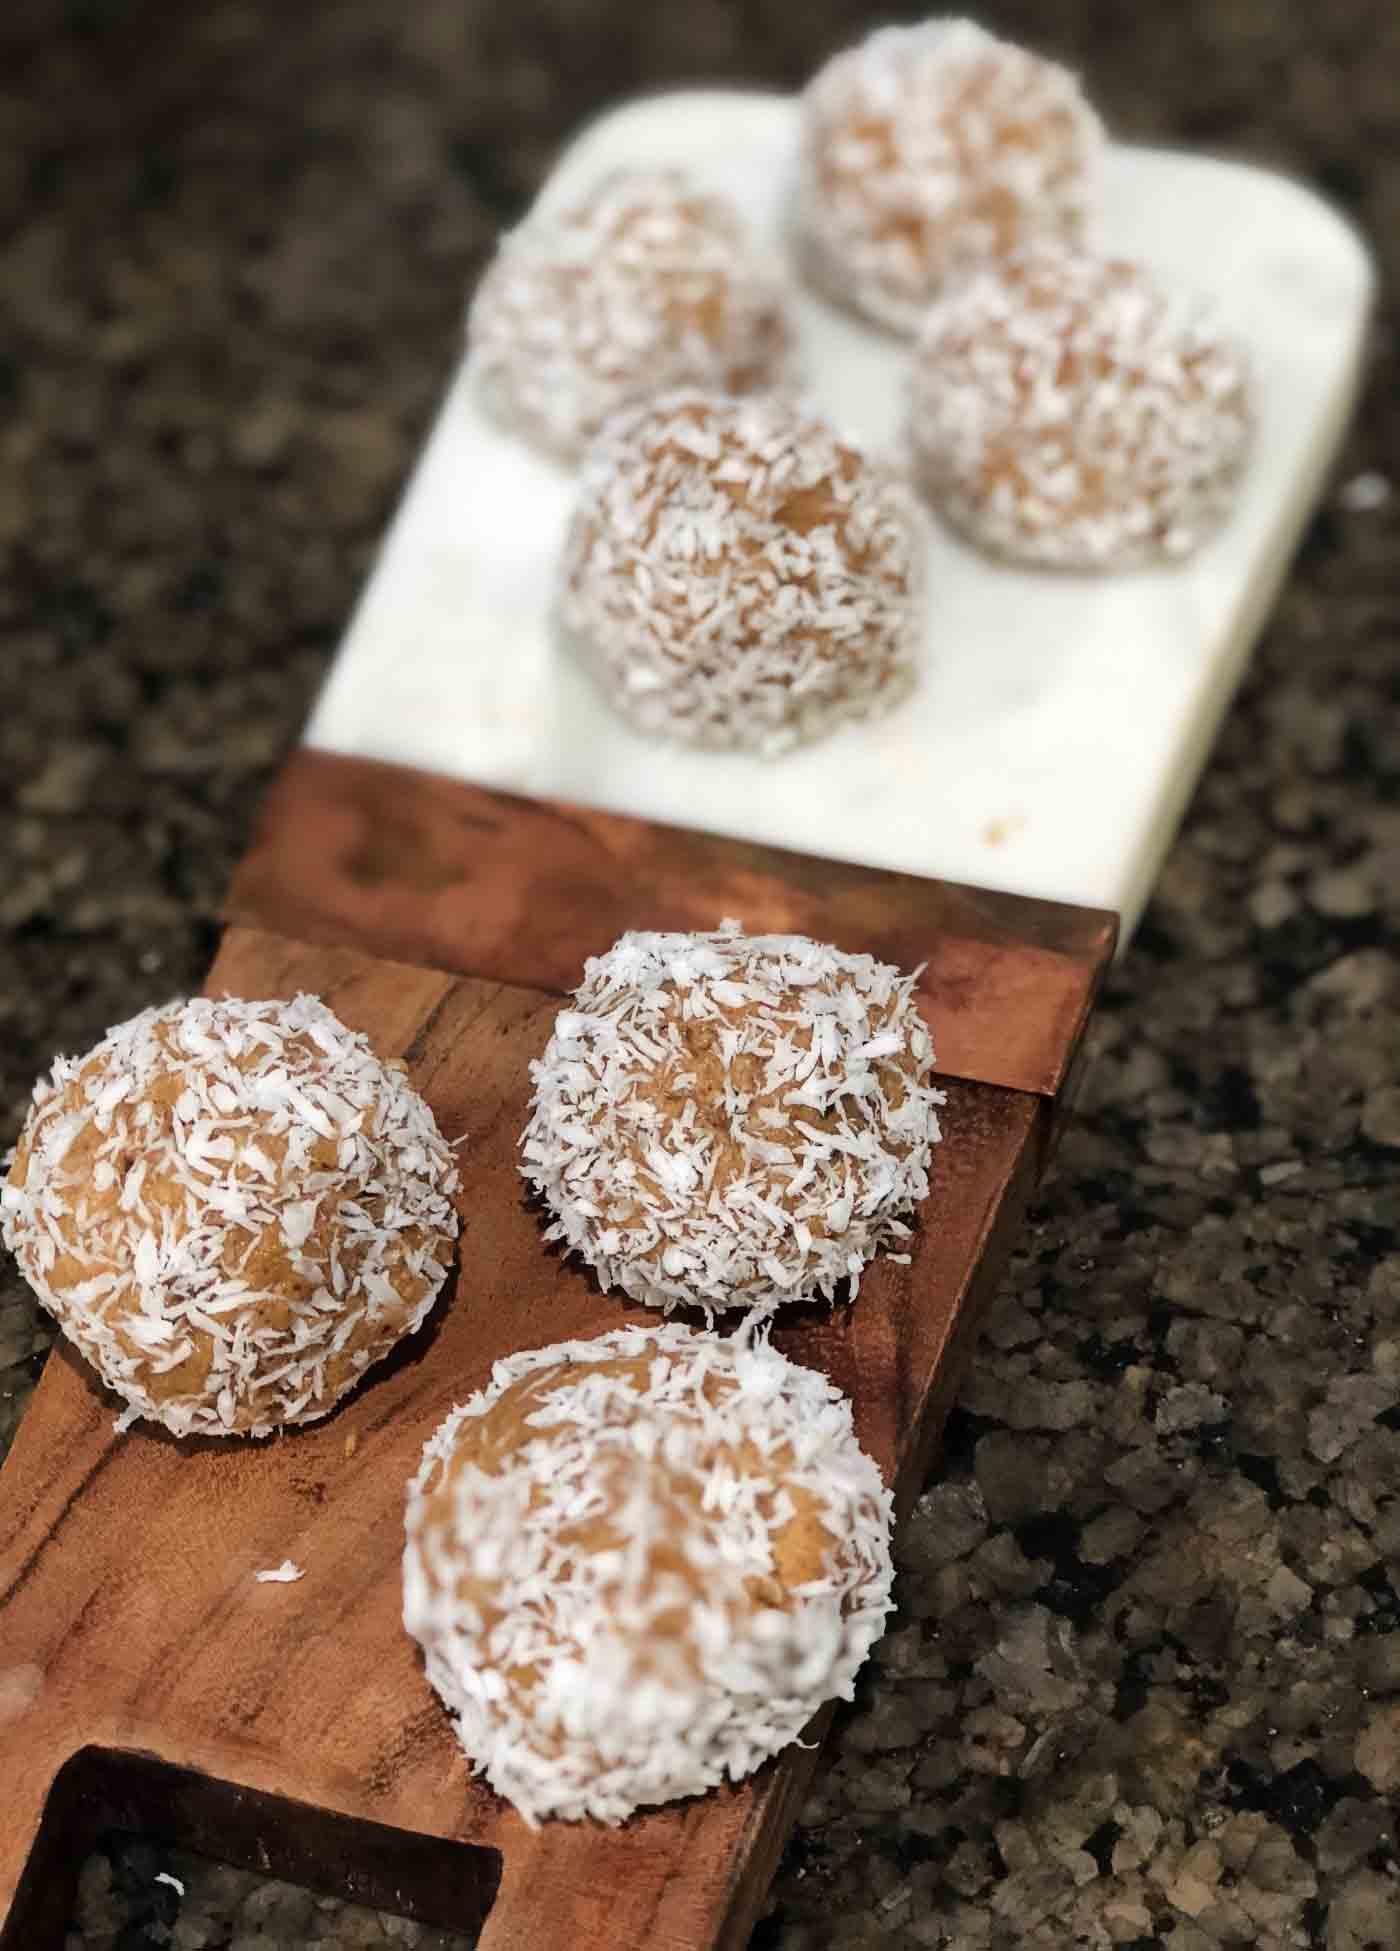 whole30 energy bites - Whole30 Snacks: Delicious Energy Bites by popular Atlanta fitness blogger Happily Hughes